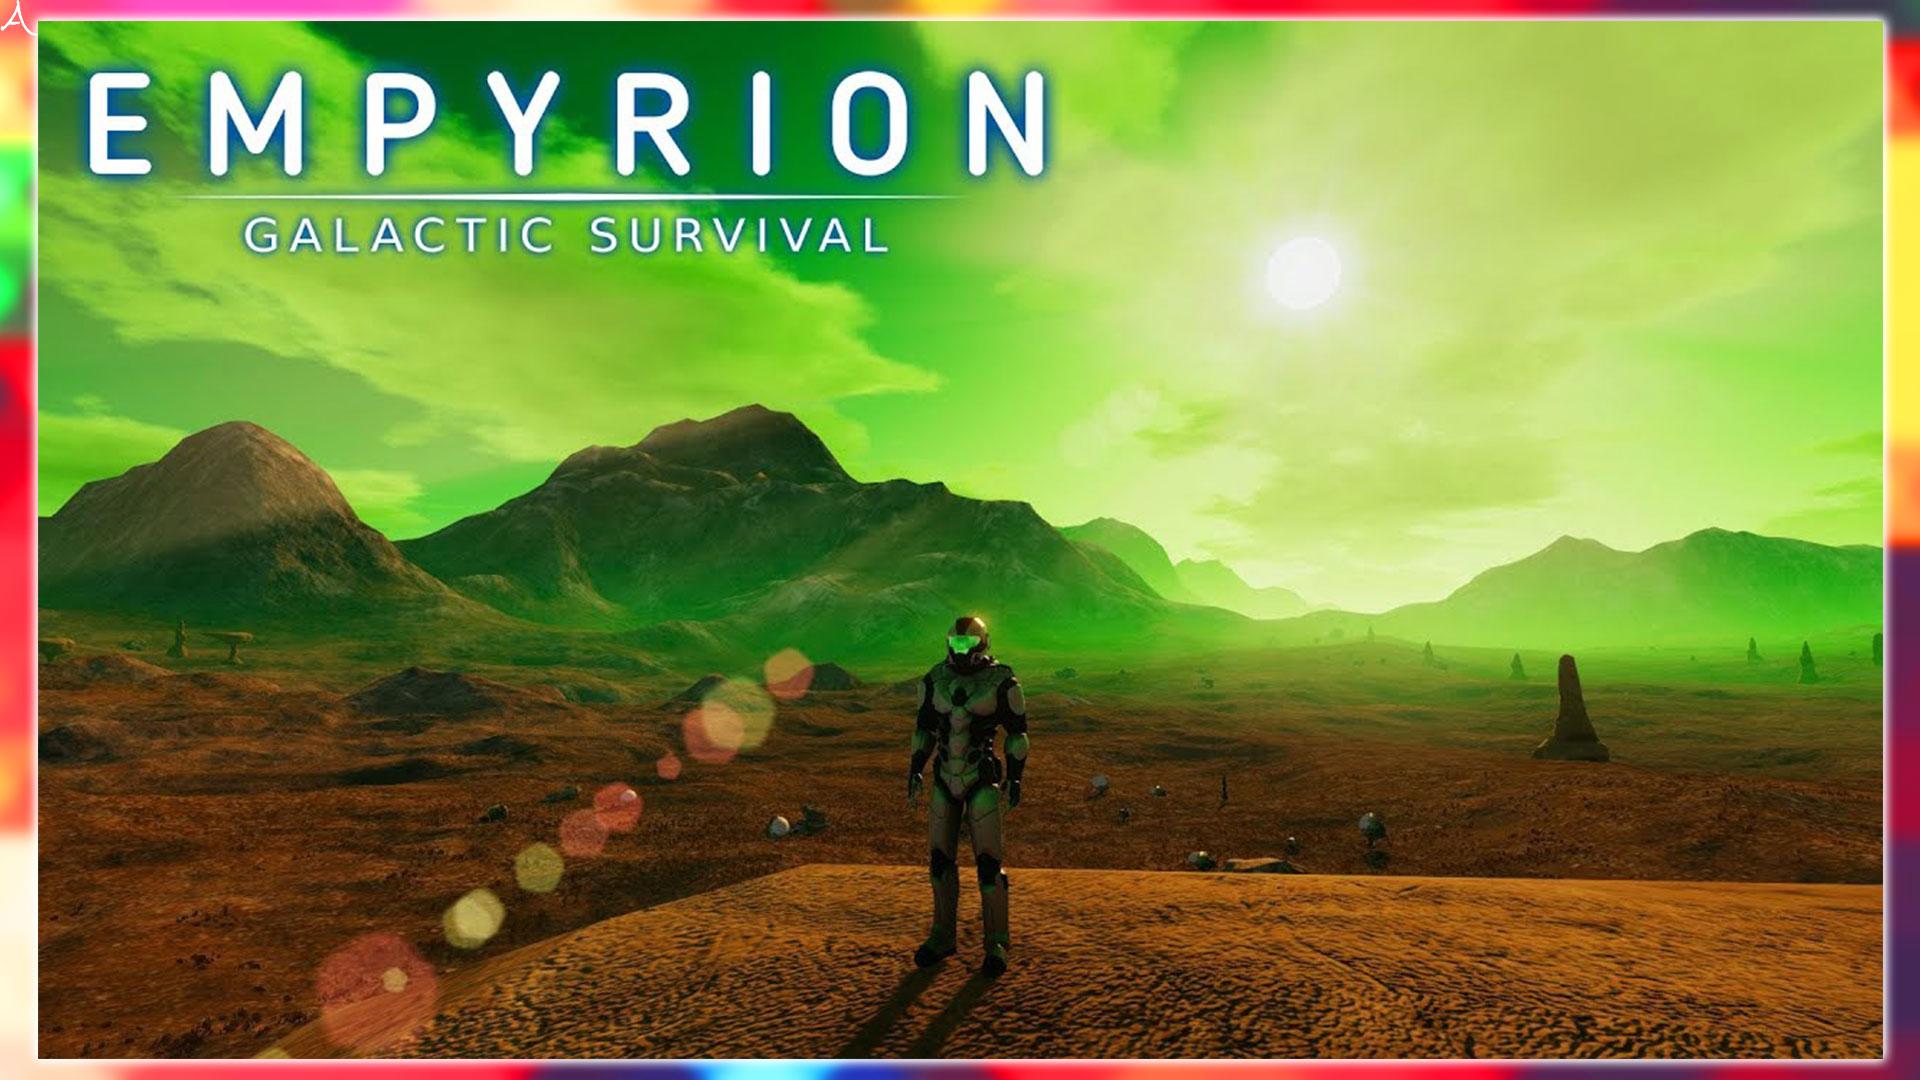 PC版「Empyrion - Galactic Survival」に必要な最低/推奨スペックを確認:快適プレイに必要な値段はどれくらい?